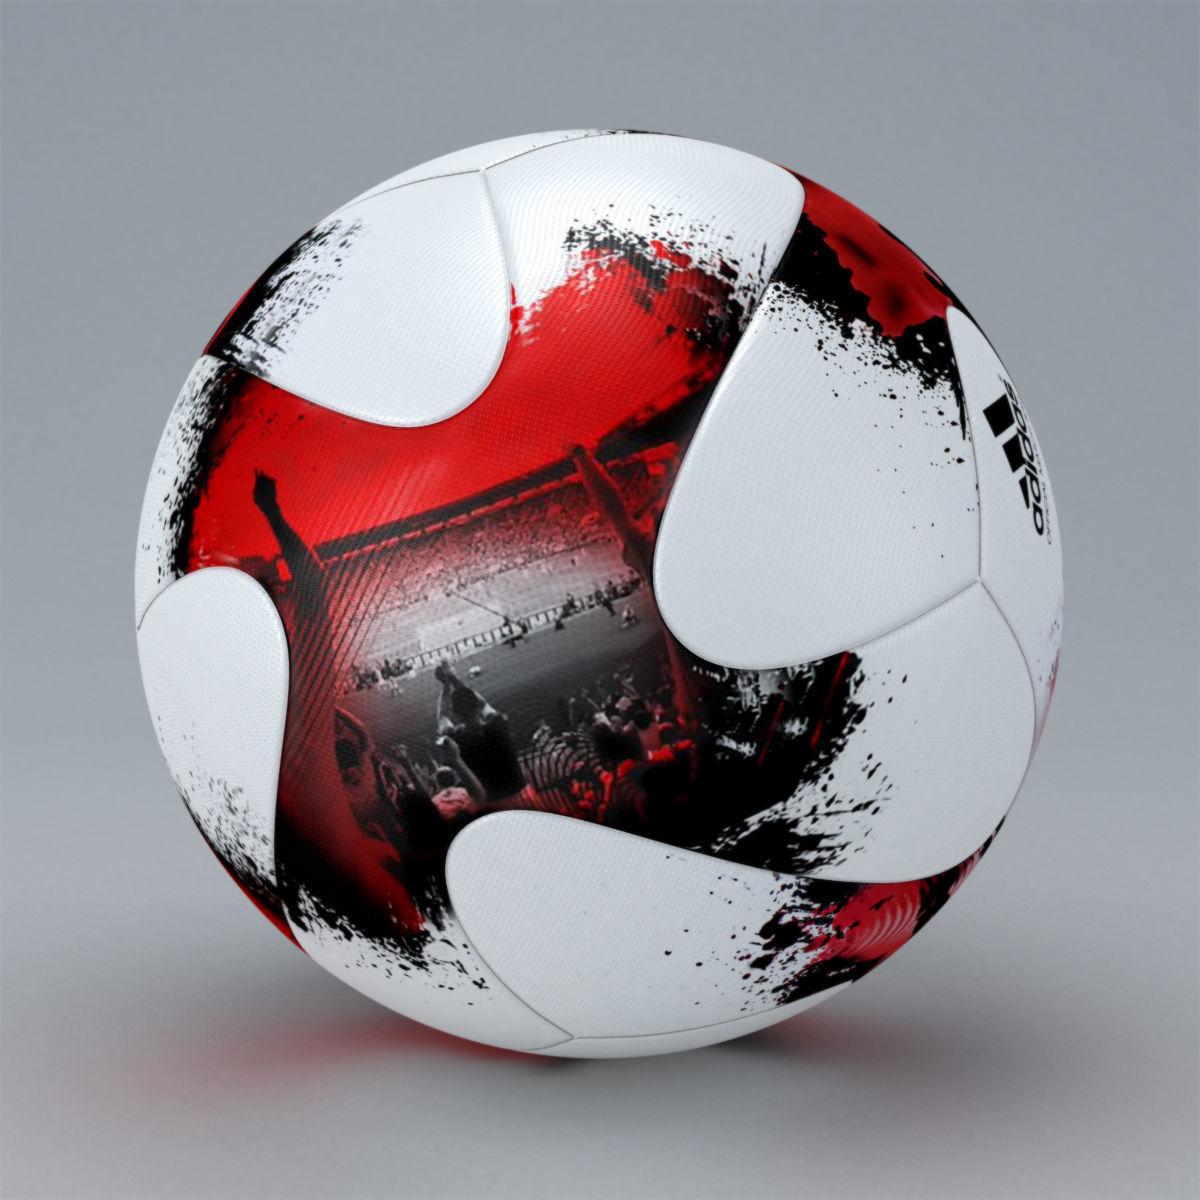 Good Football Ball World Cup 2018 - fifa-2018-official-match-balls-worldcup-russia-3d-model-max-obj-3ds  Pic_249740 .jpg